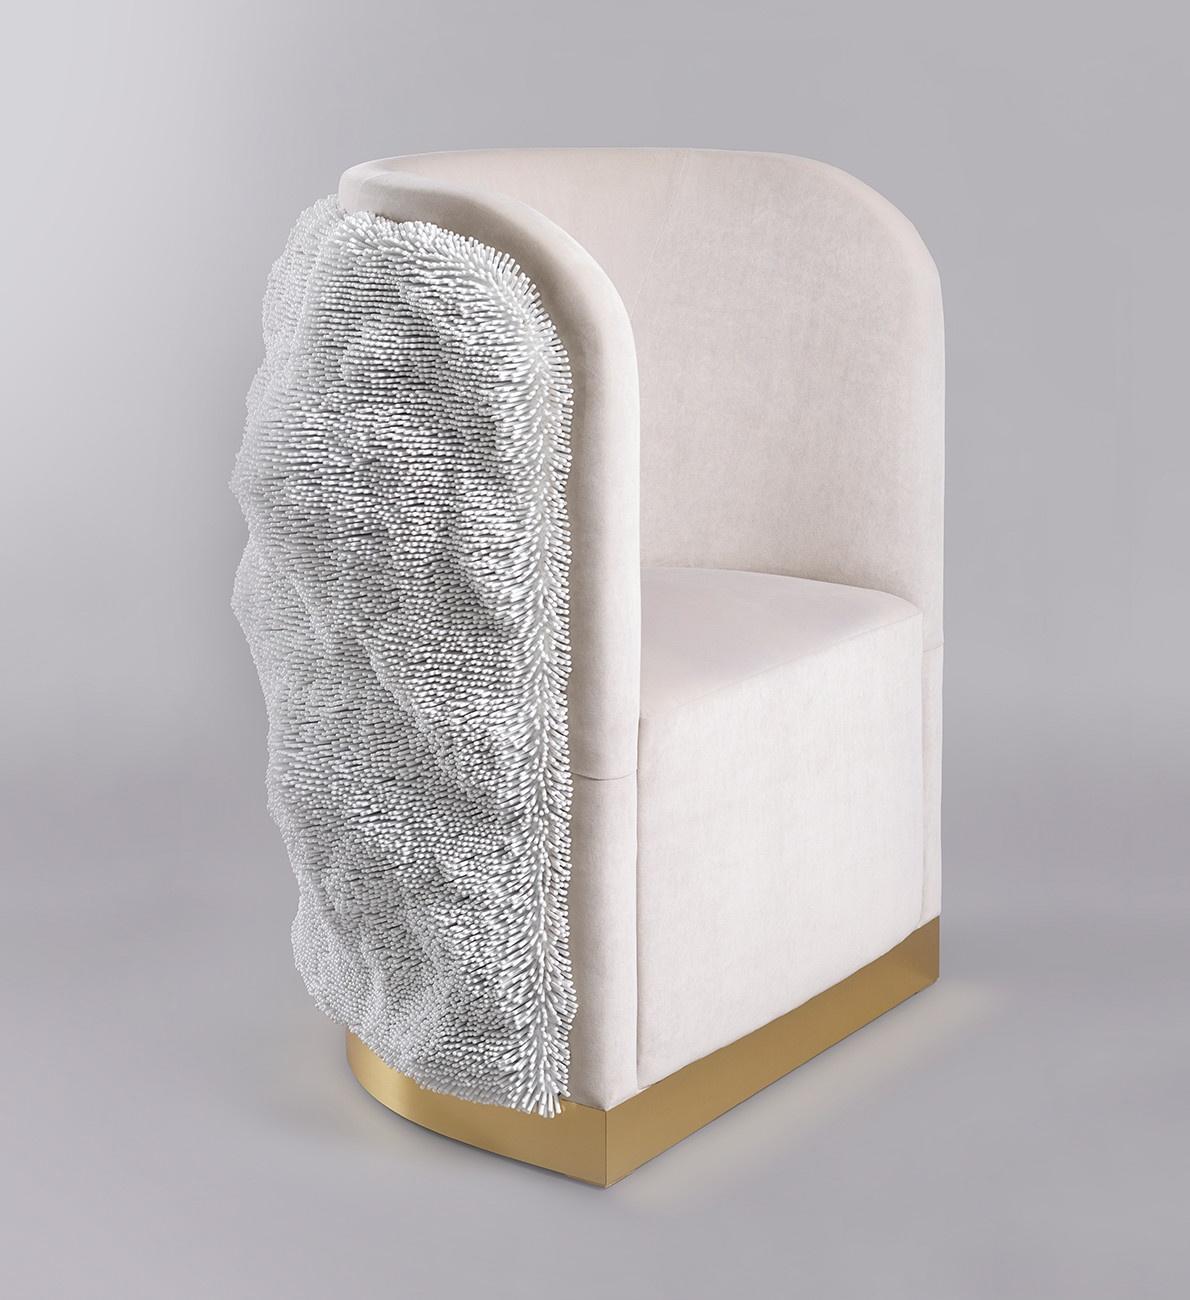 sea-anemone-armchair_header-01_01